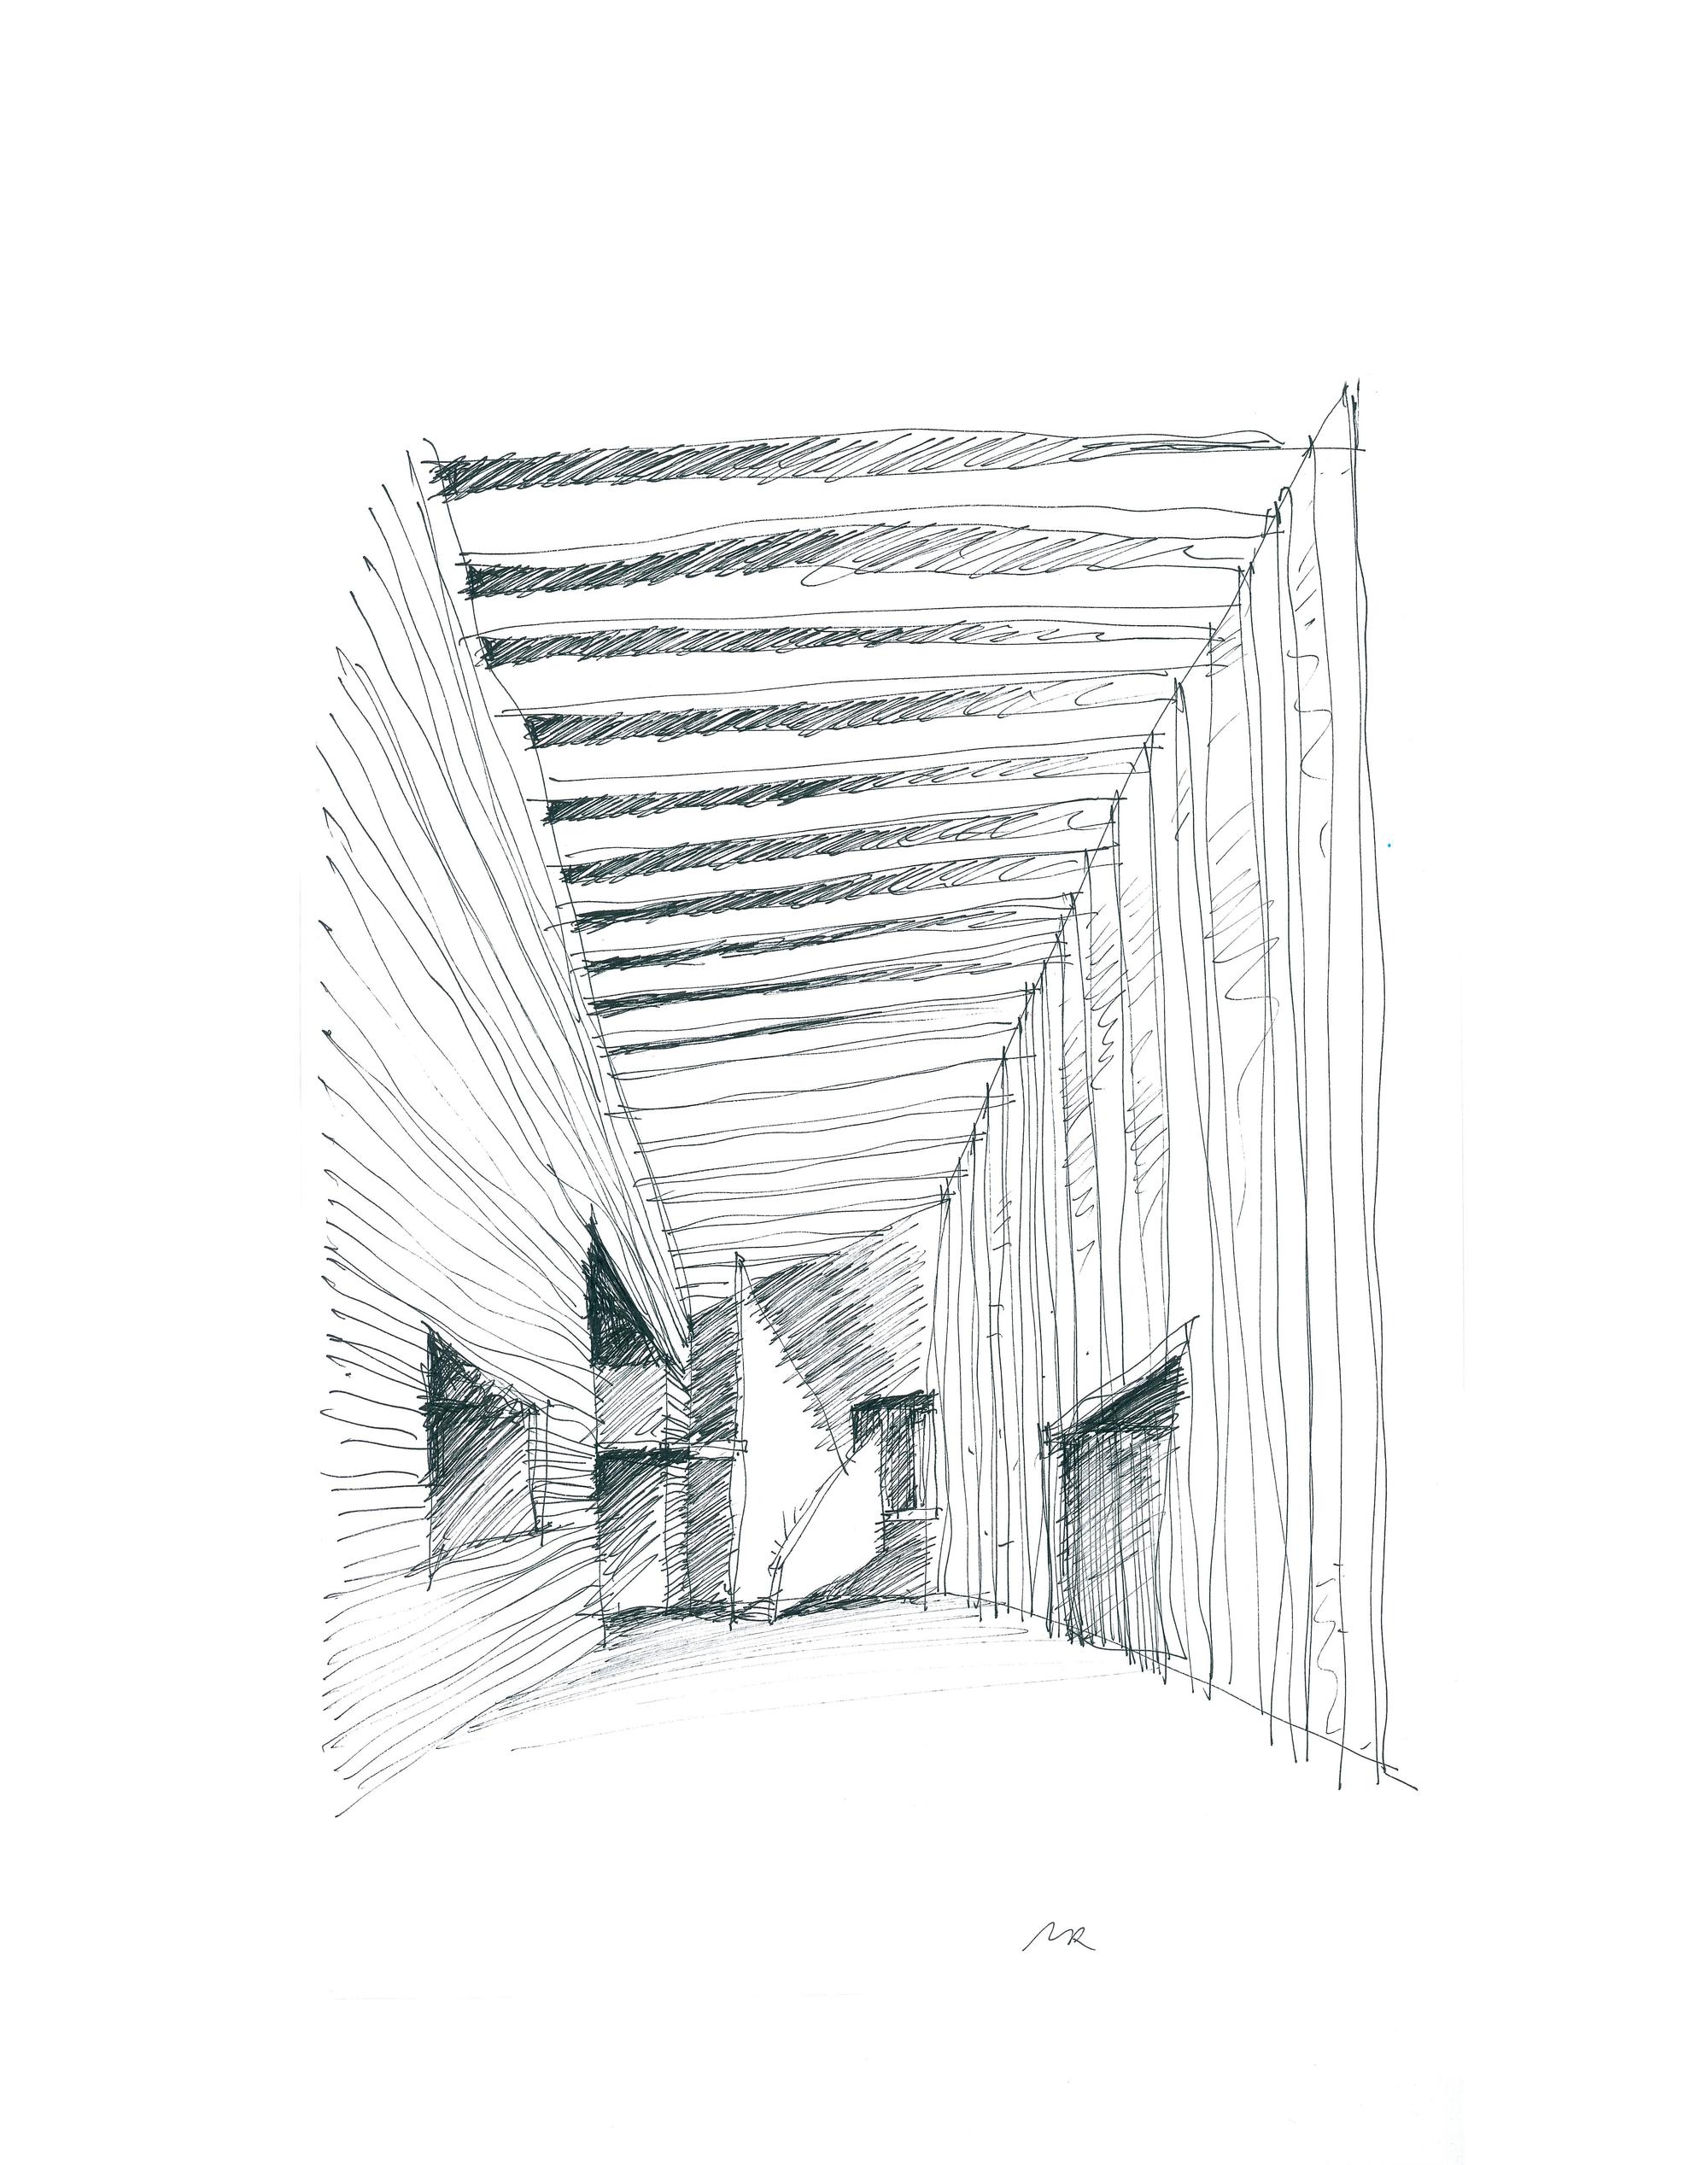 http://ad009cdnb.archdaily.net/wp-content/uploads/2013/11/5131448cb3fc4b0d98001454_carlos-santa-mar-a-center-jaam-sociedad-de-arquitectura_1337622221-jaam-ccs-25.png